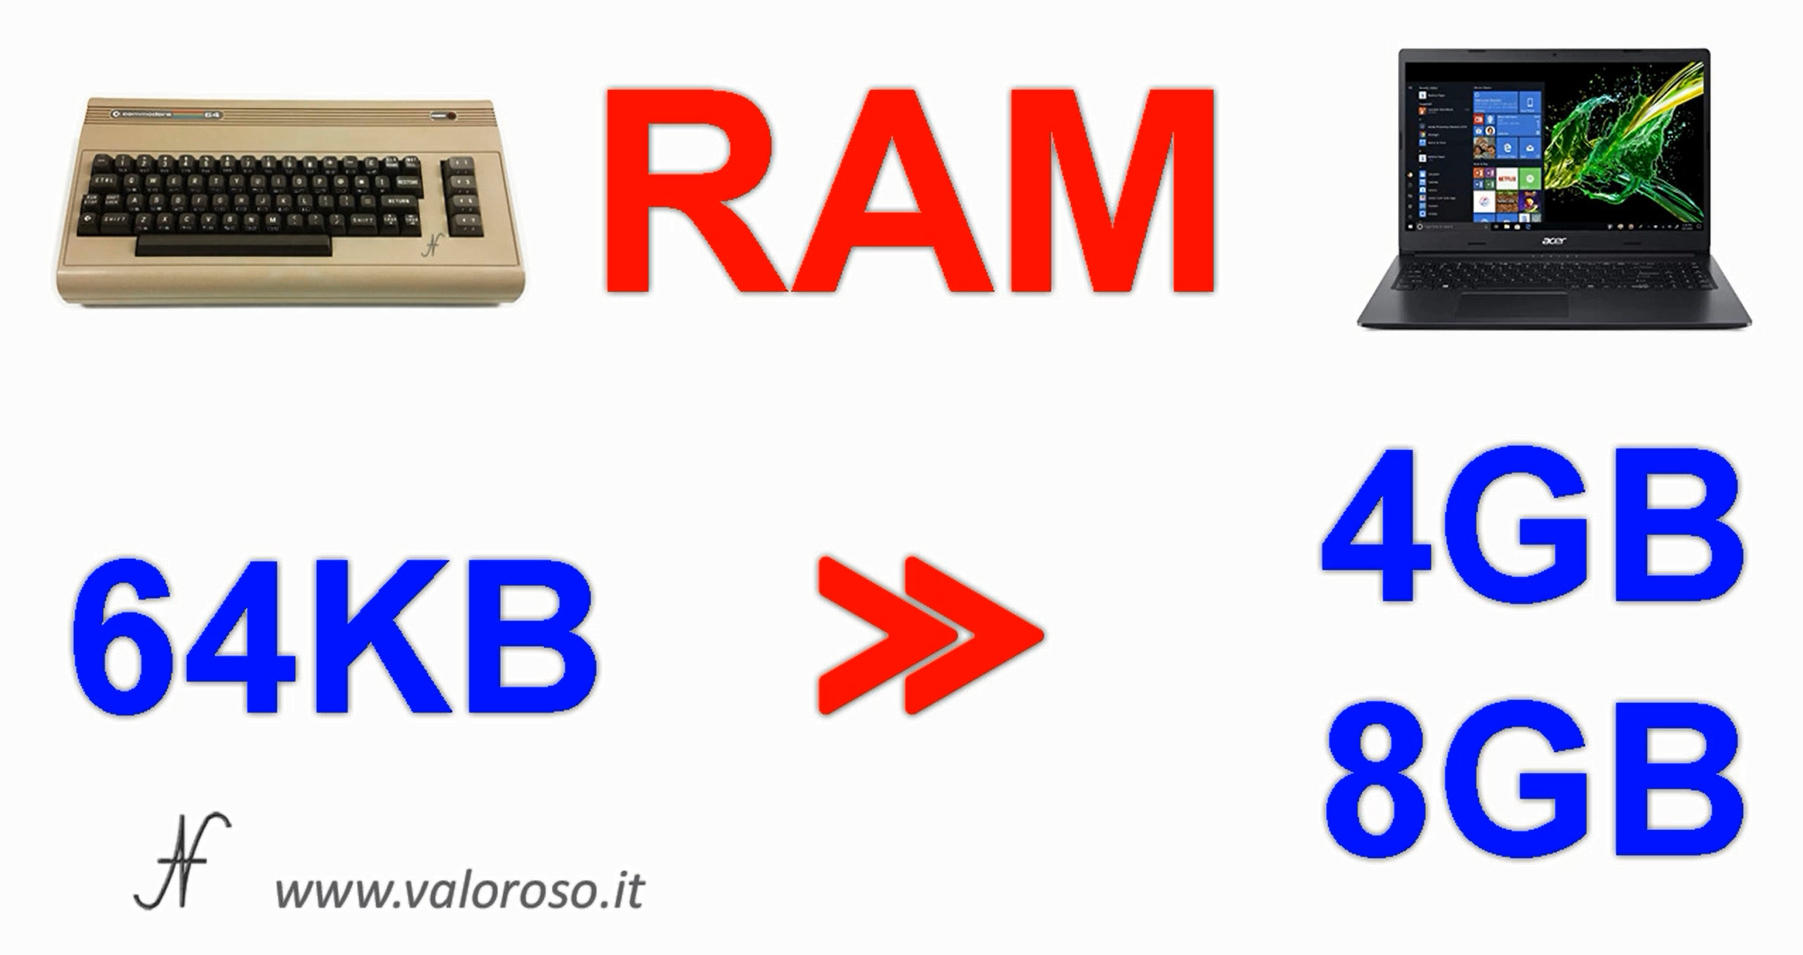 Commodore 64 Vs PC moderno, confronto capacità memoria RAM, KByte, GByte